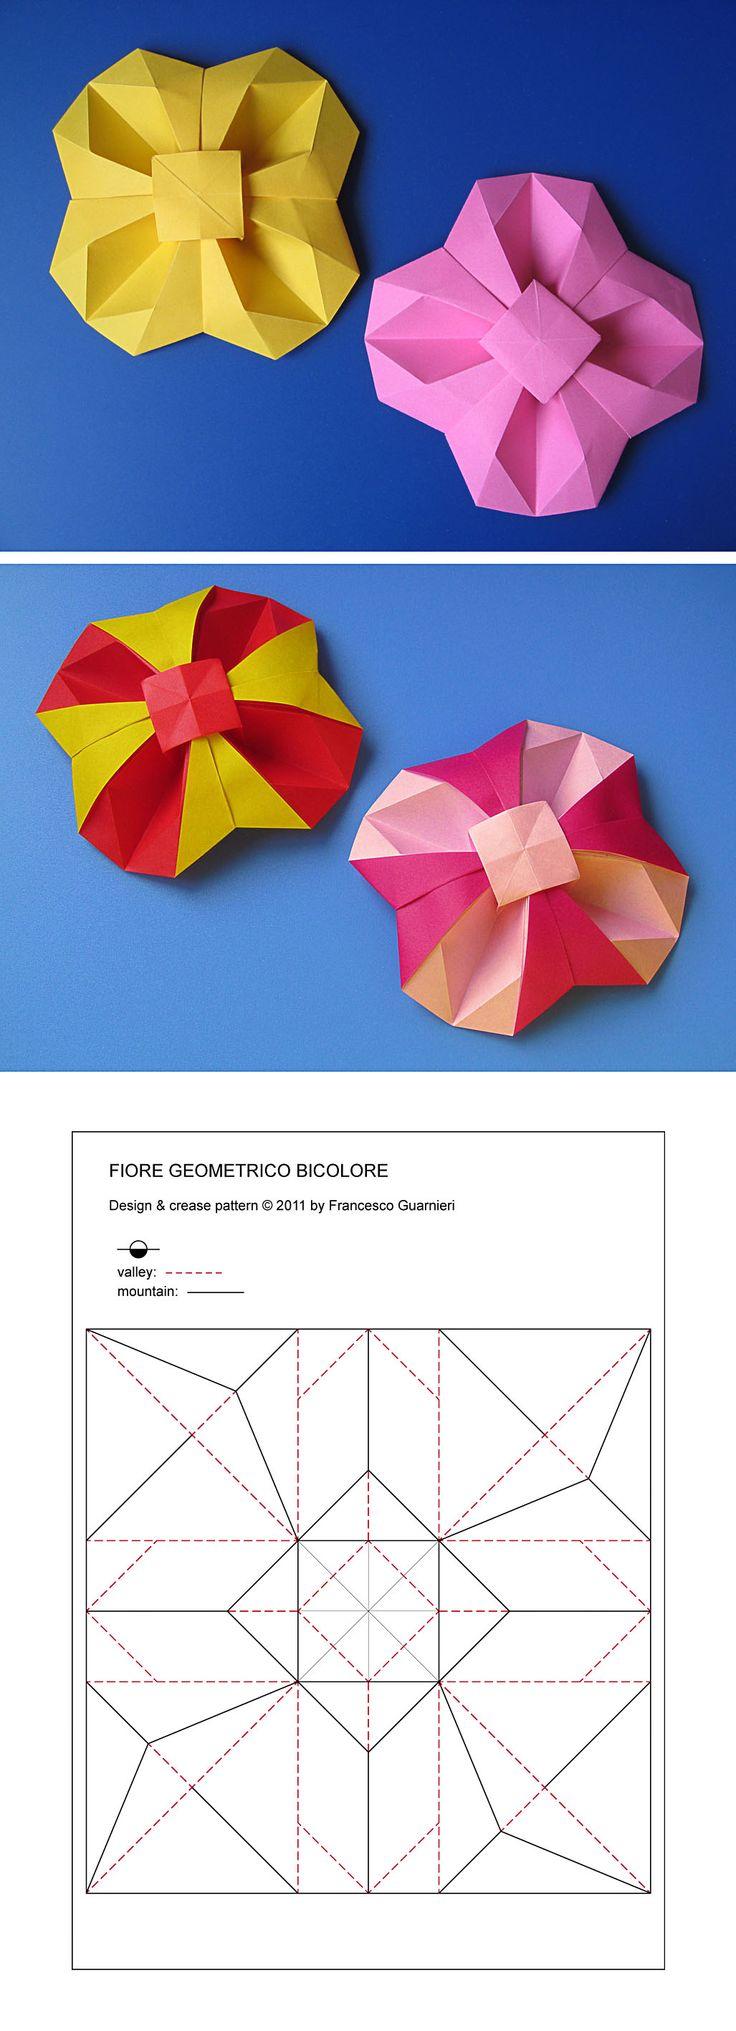 Origami: Fiore geometrico - Geometric Flower; Fiore geometrico bicolore - Bicolor Geometric Flower. Designed and folded by Francesco Guarnieri, April 2011. Crease Pattern: http://guarnieri-origami.blogspot.it/2013/01/fiore-geometrico.html